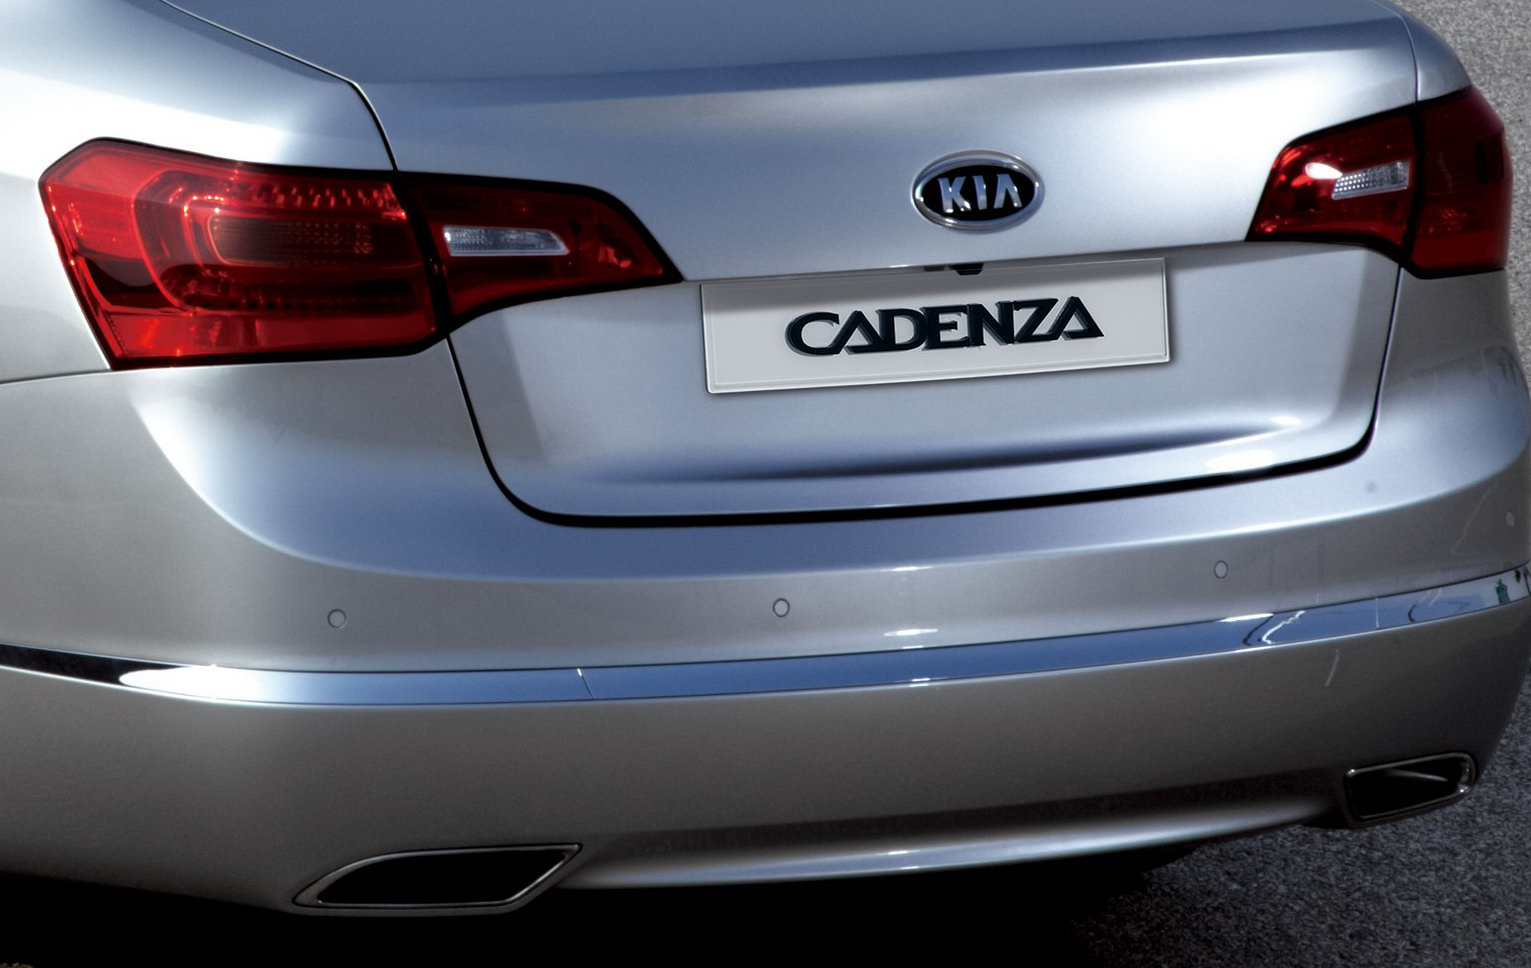 Kia Cadenza 2011 >> Kia Cadenza 2011 - Foto 14 di 21